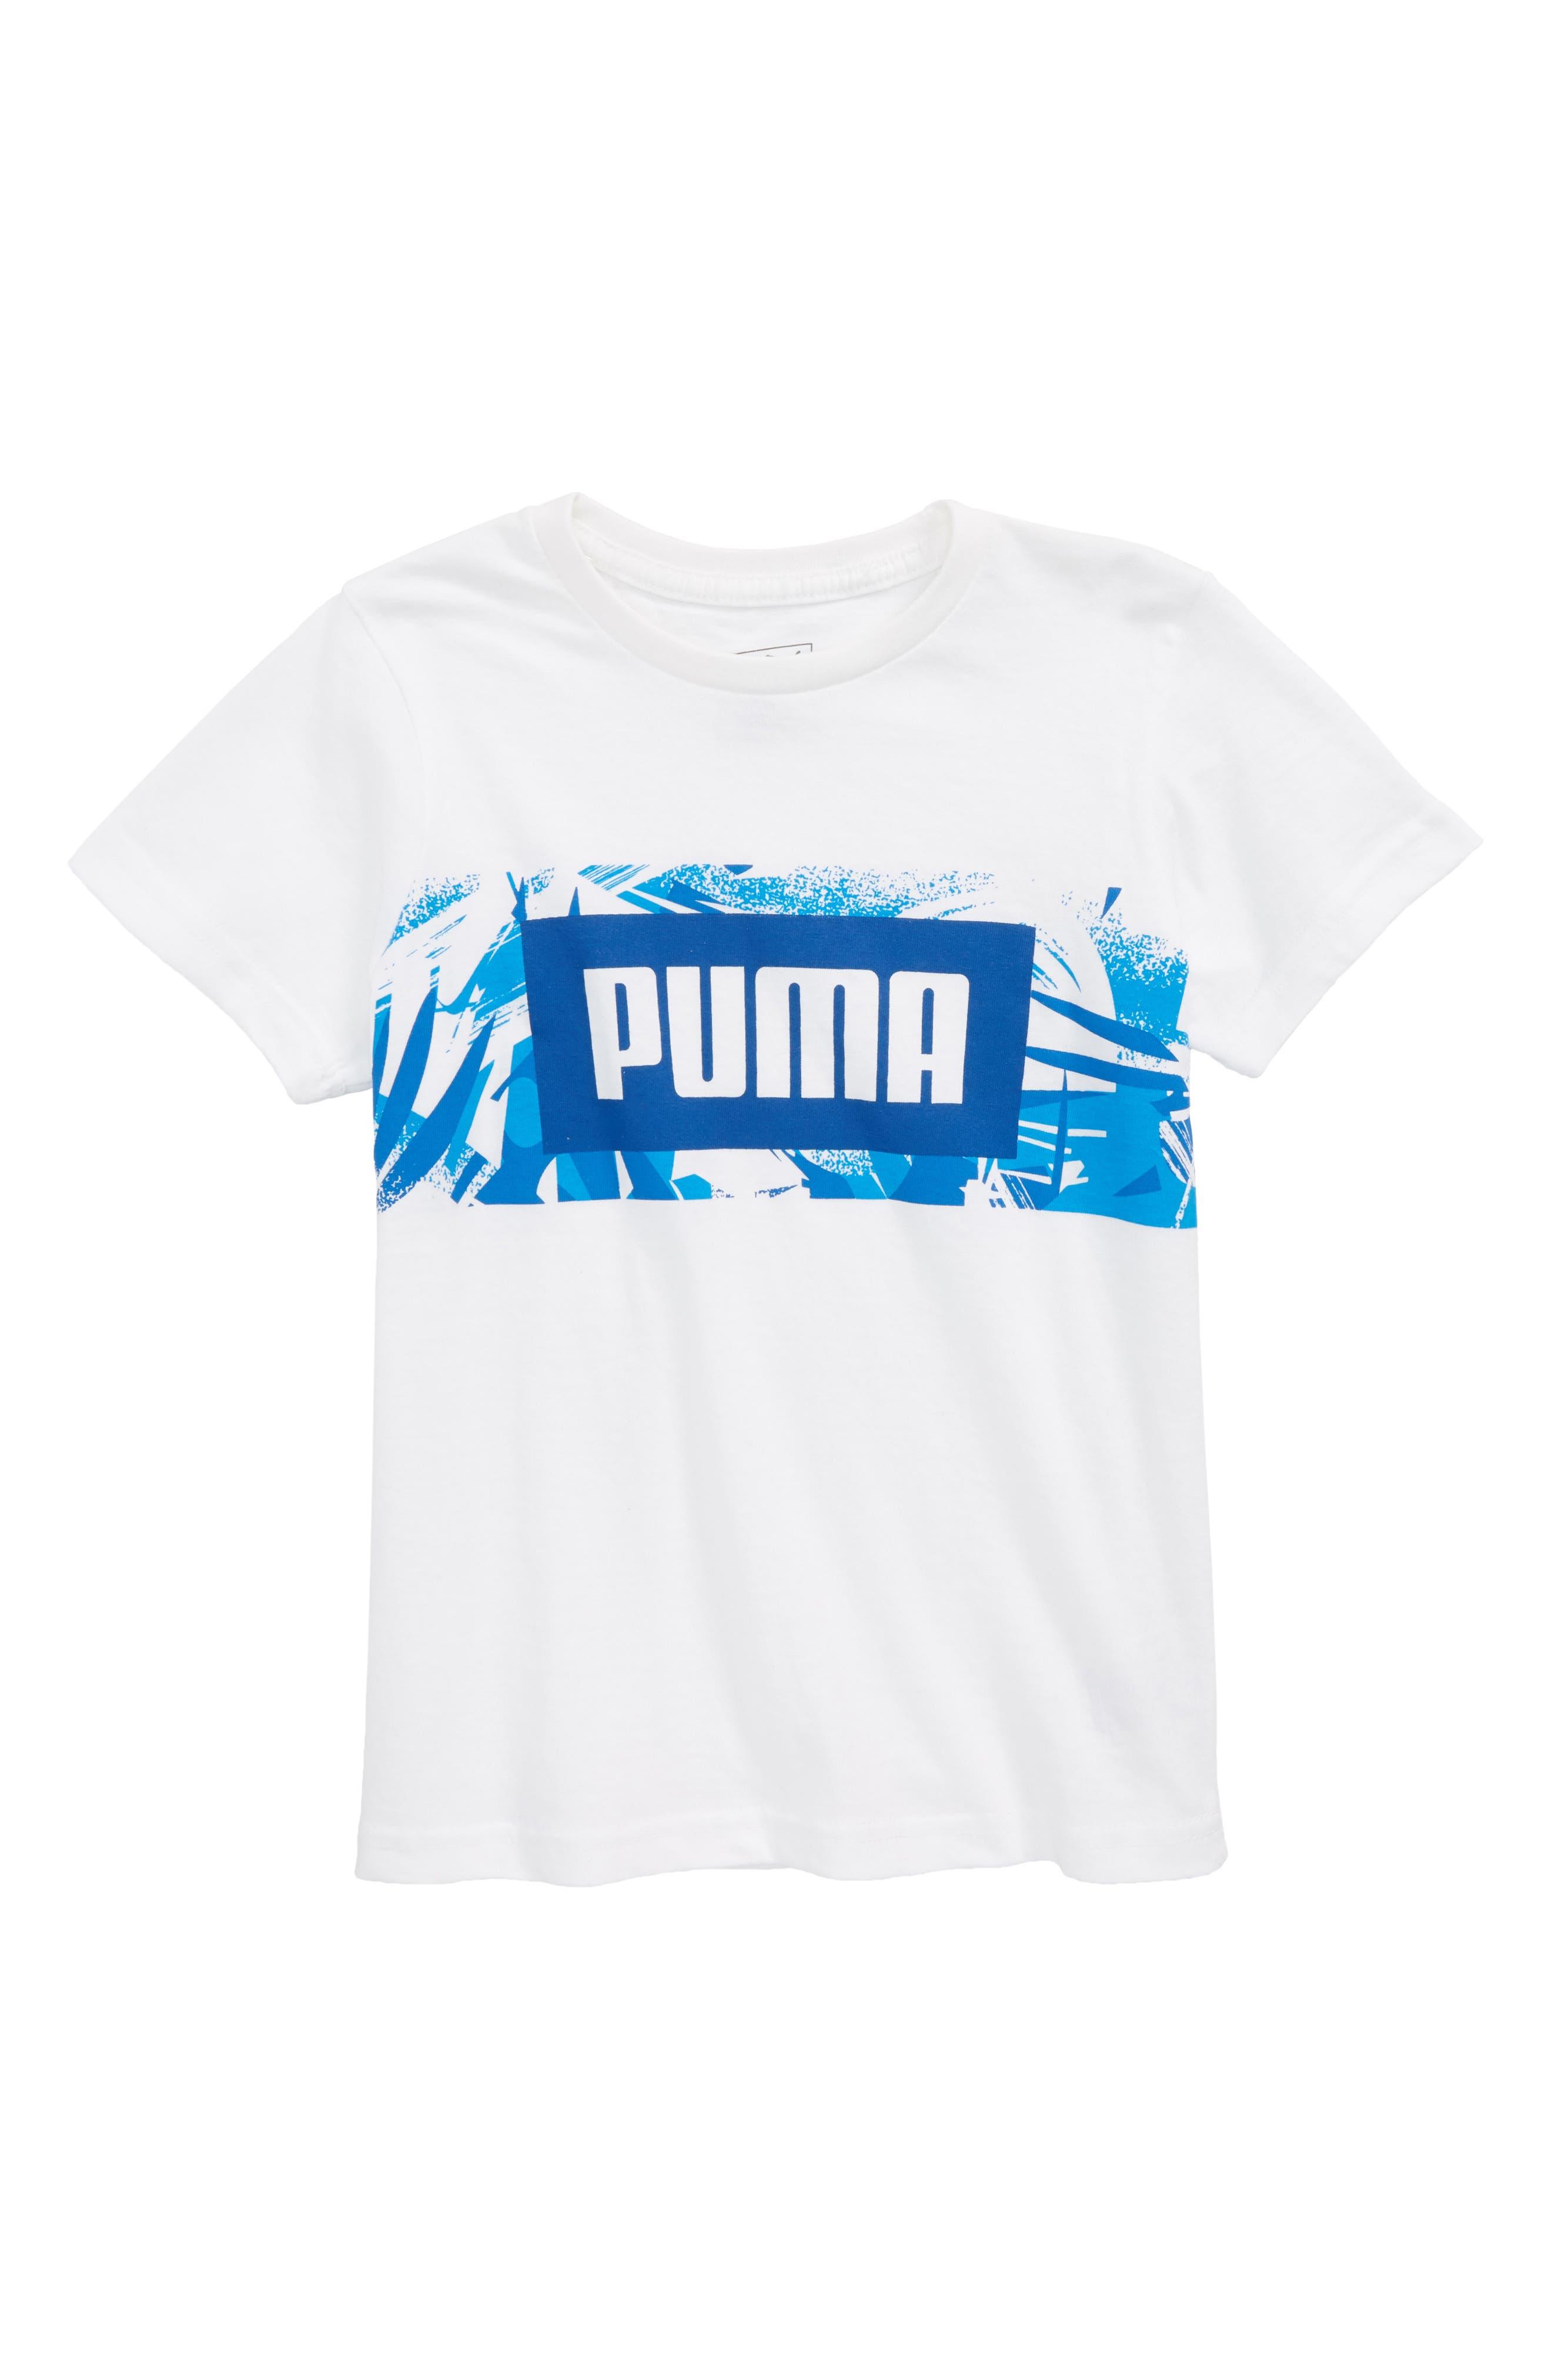 Puma Graphic T-Shirt (Little Boys)